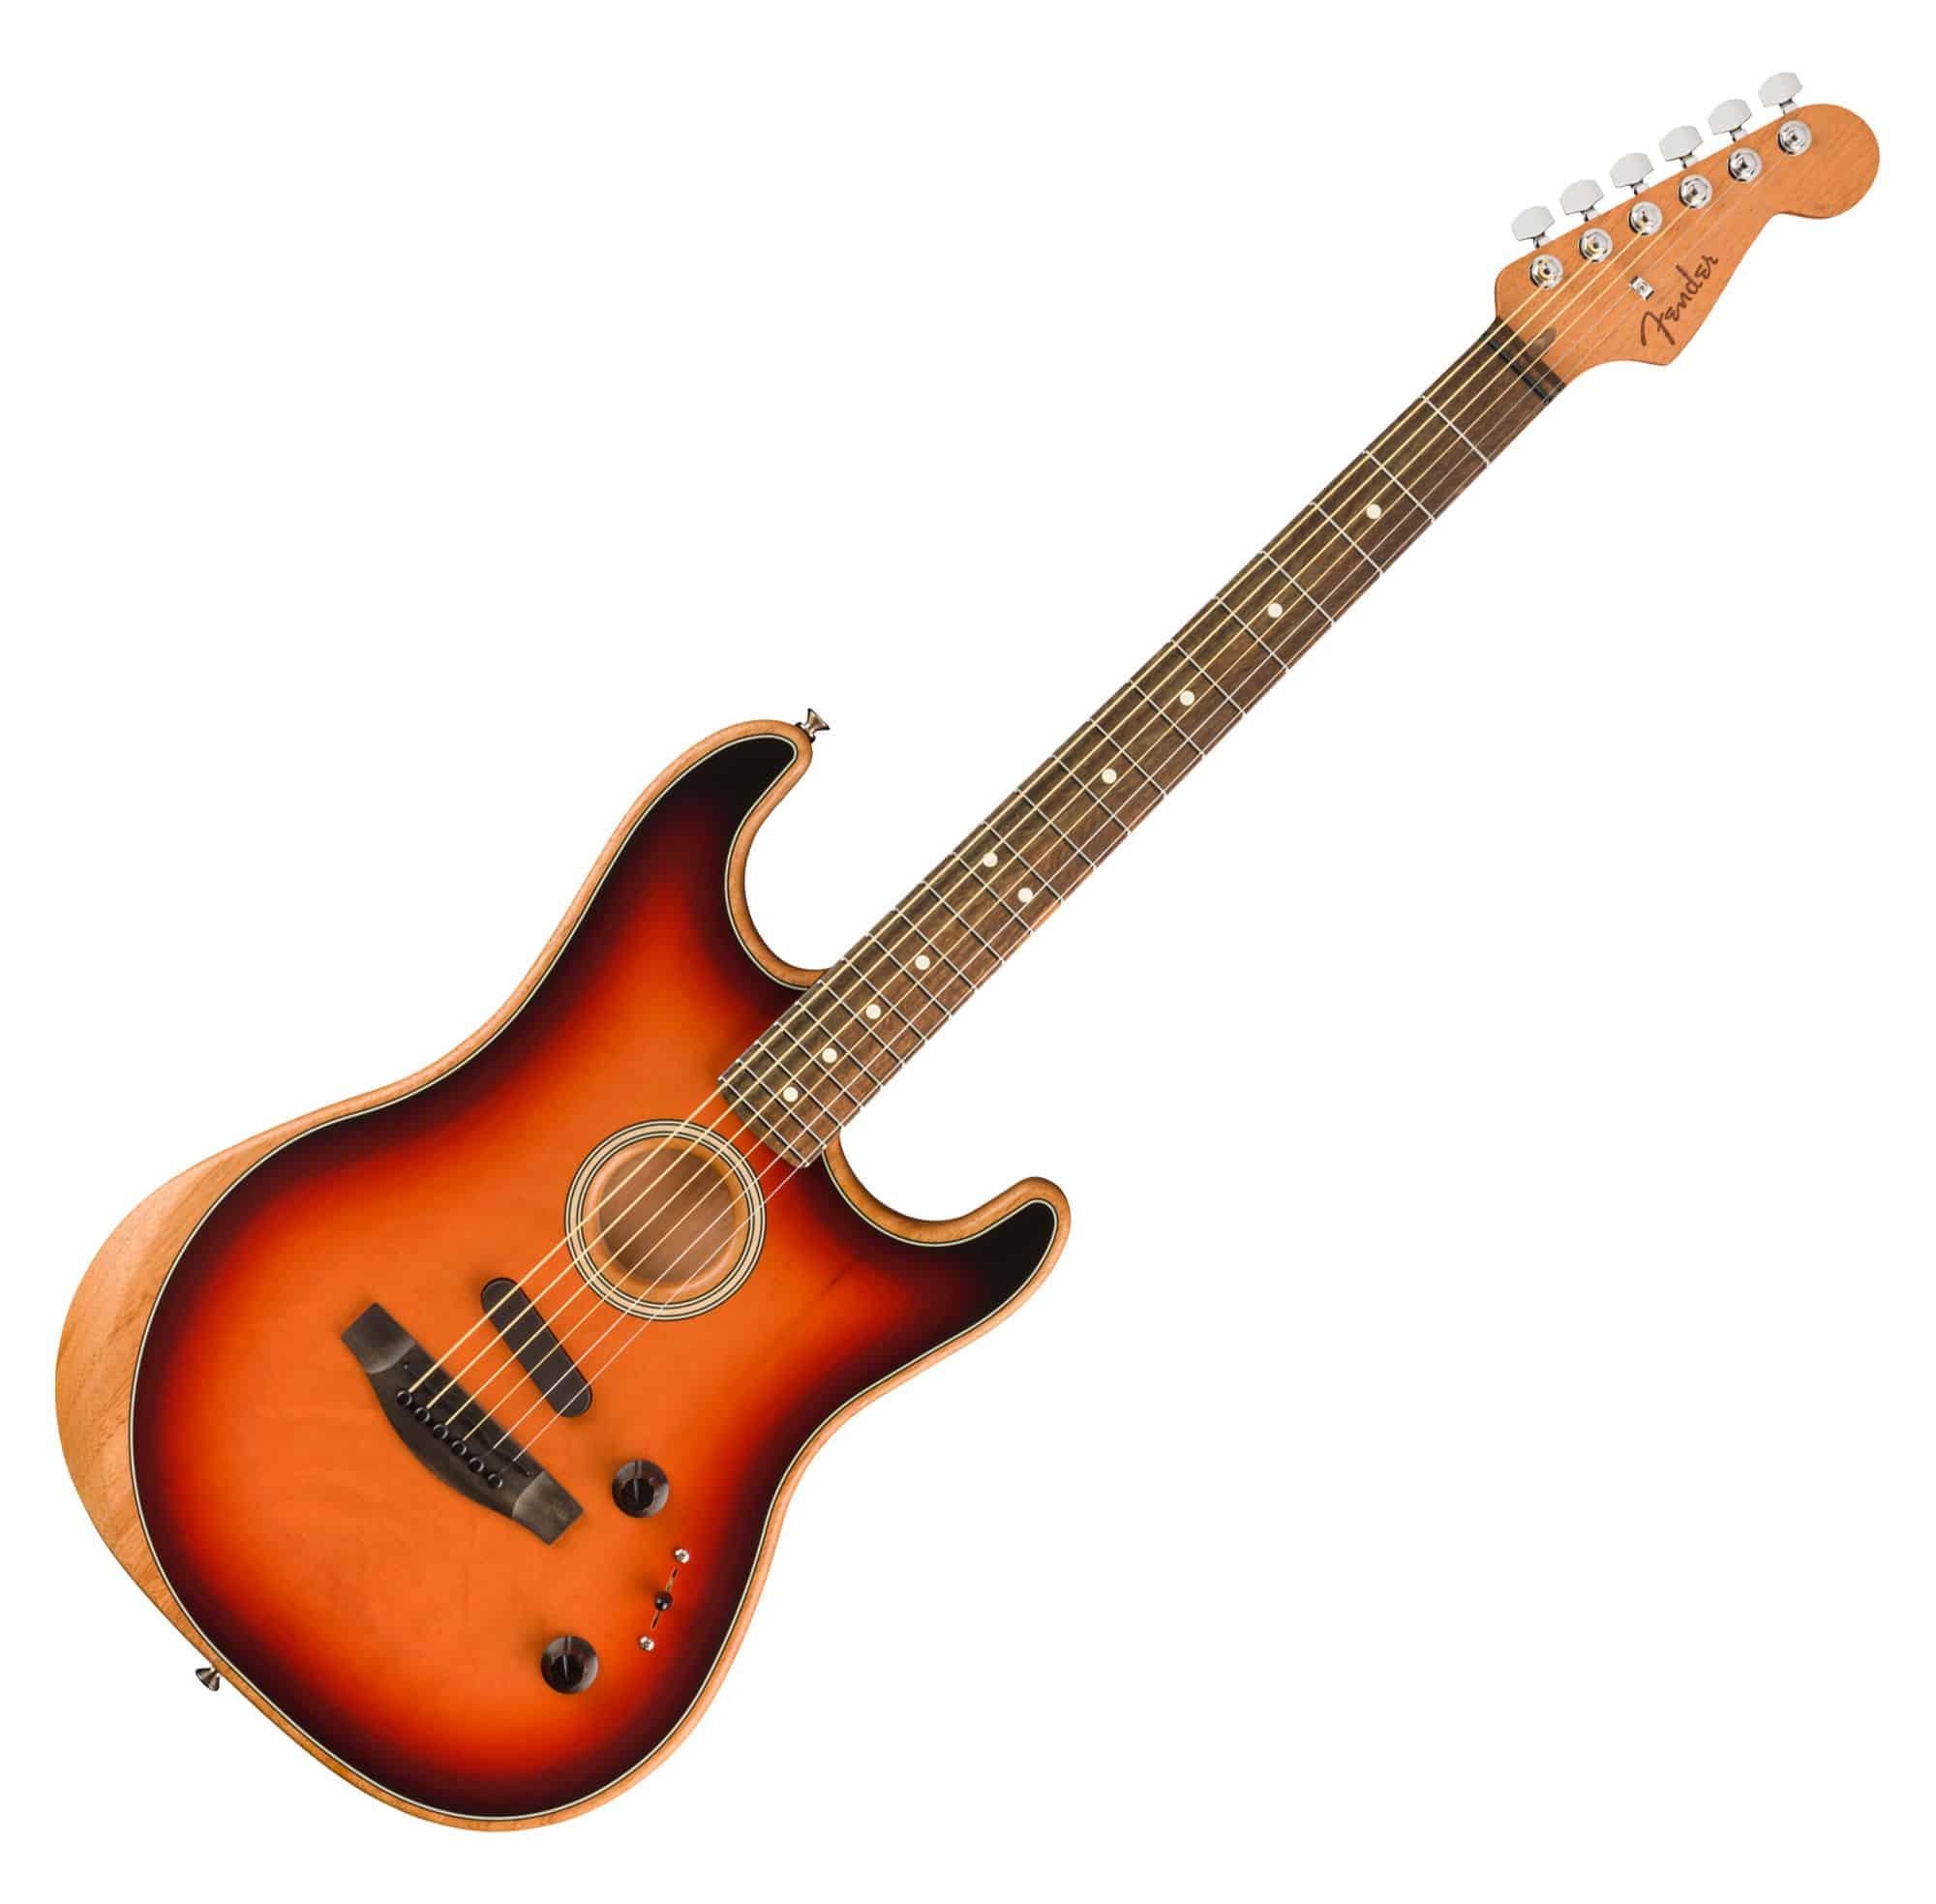 Egitarren - Fender American Acoustasonic Strat 3CS - Onlineshop Musikhaus Kirstein